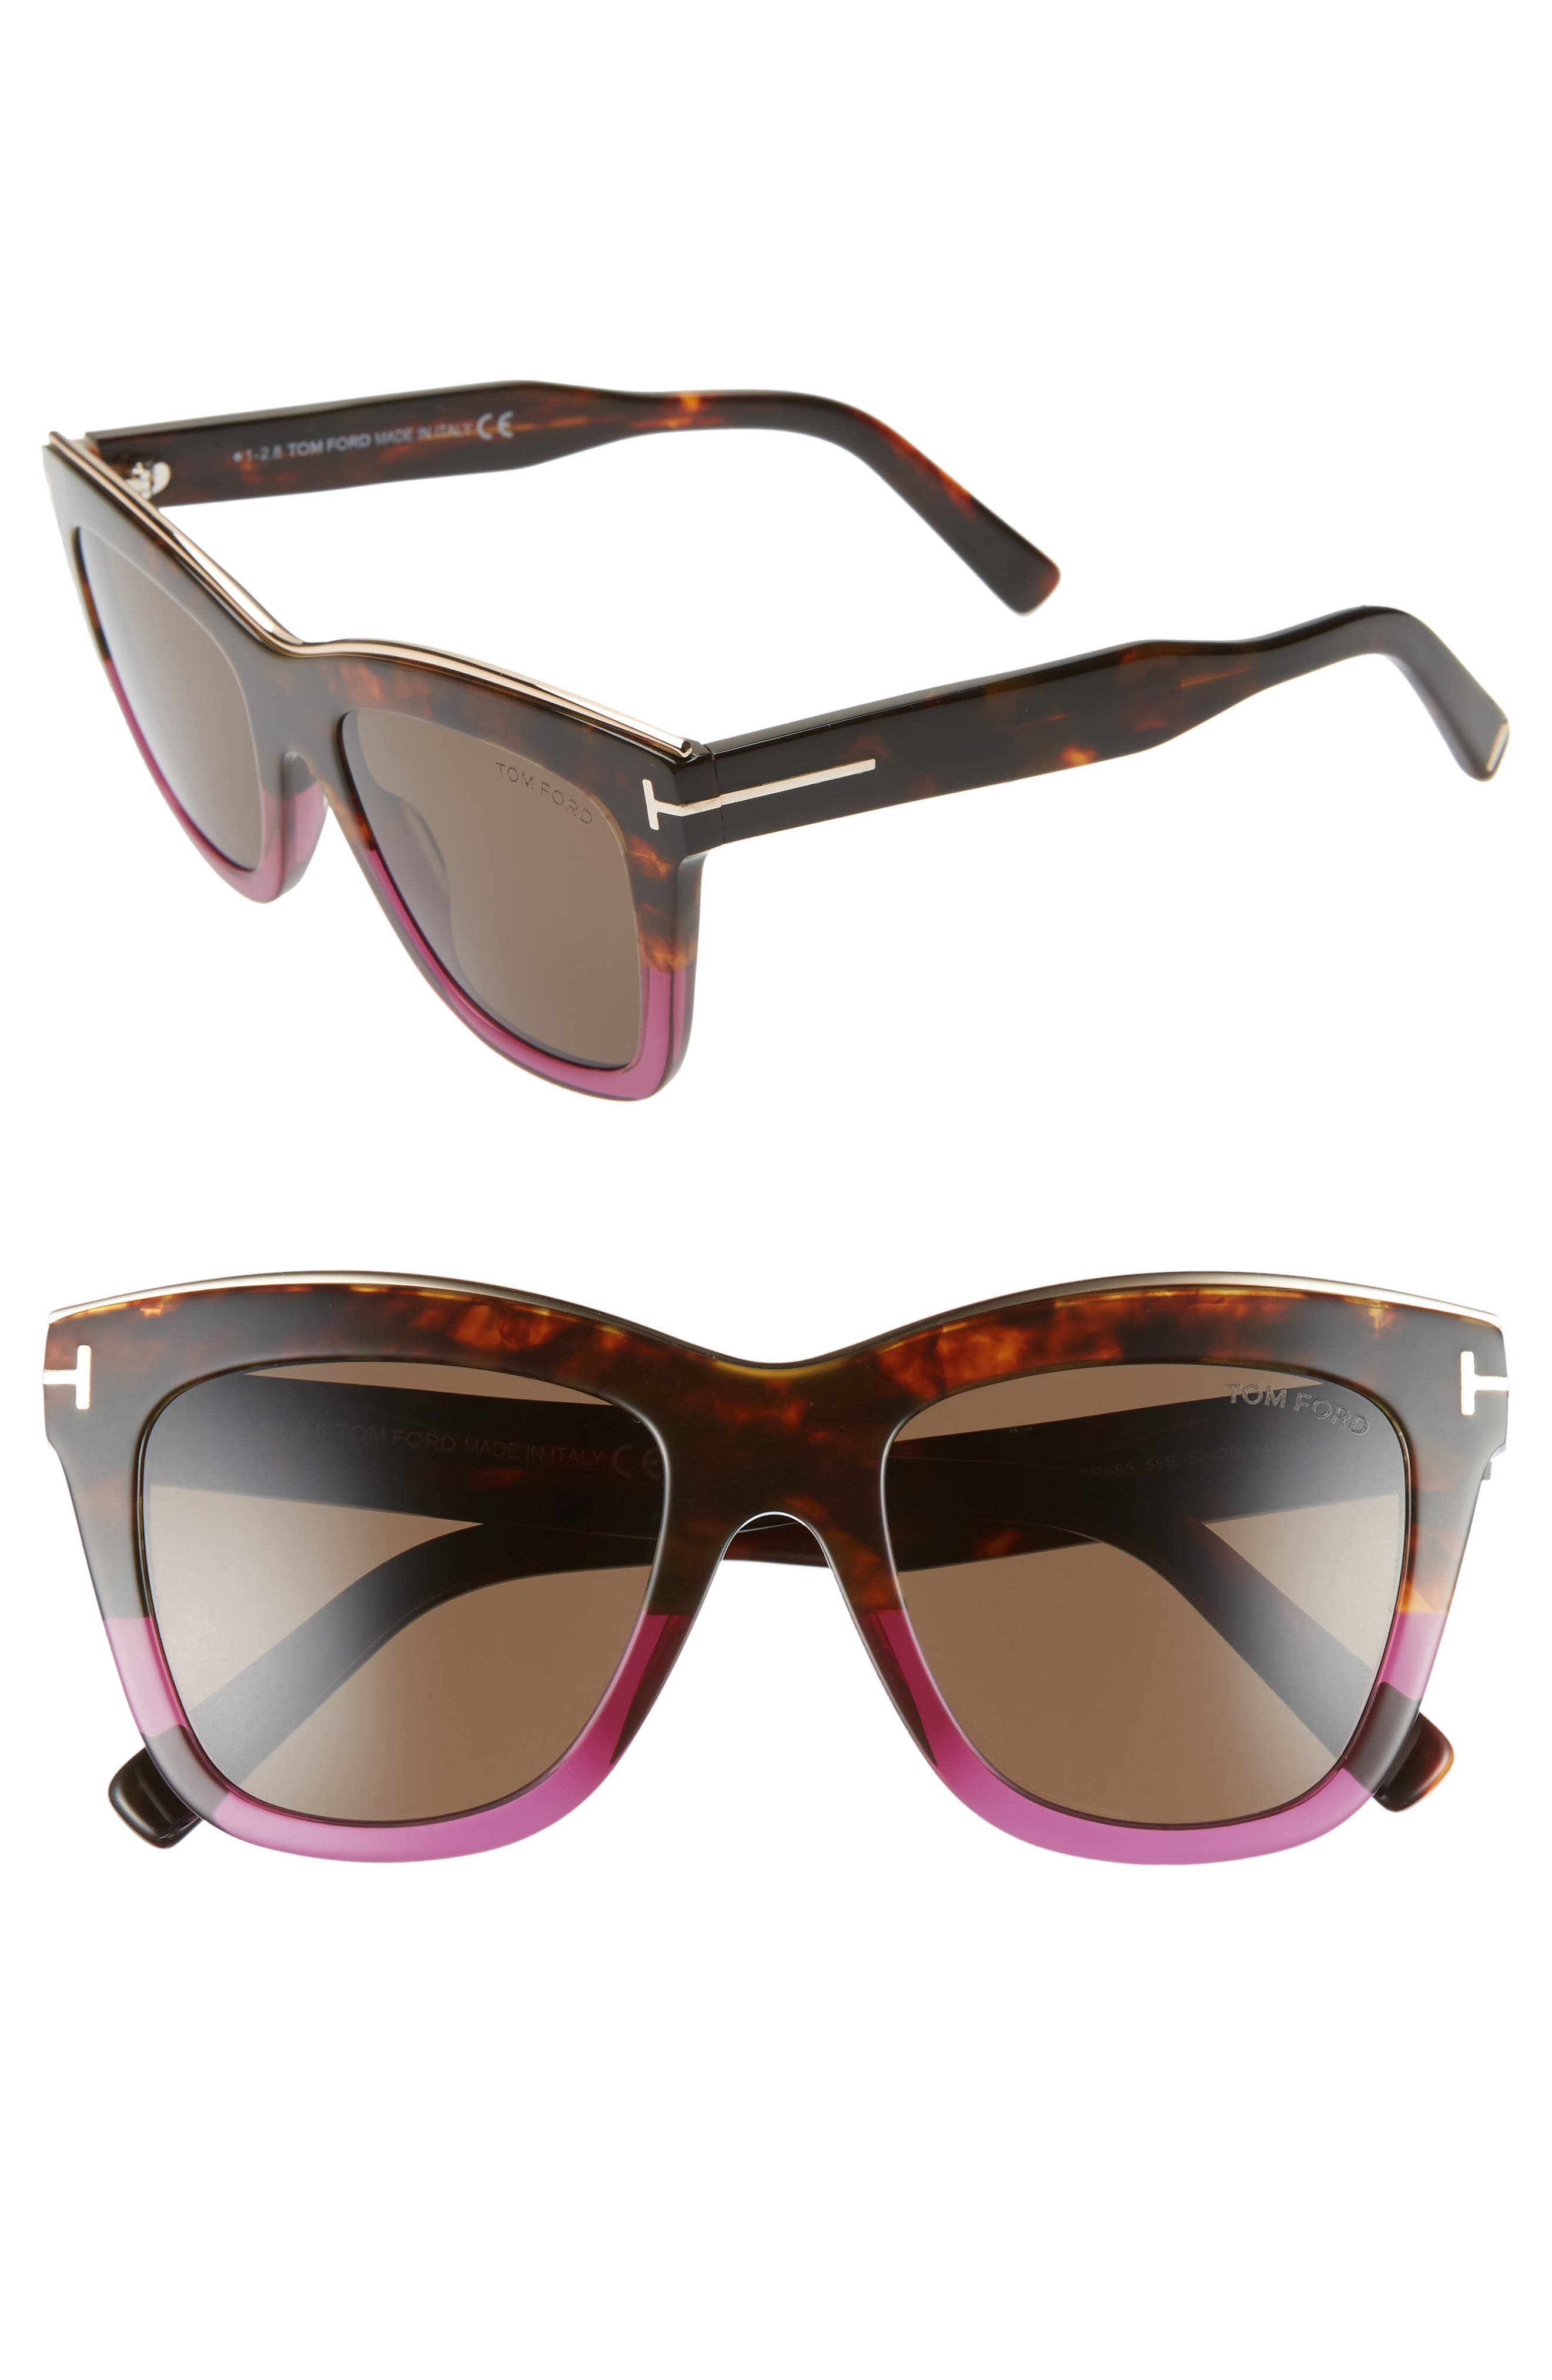 Tom Ford Julie 52Mm Sunglasses - Vintage Havana/ Purple/ Brown